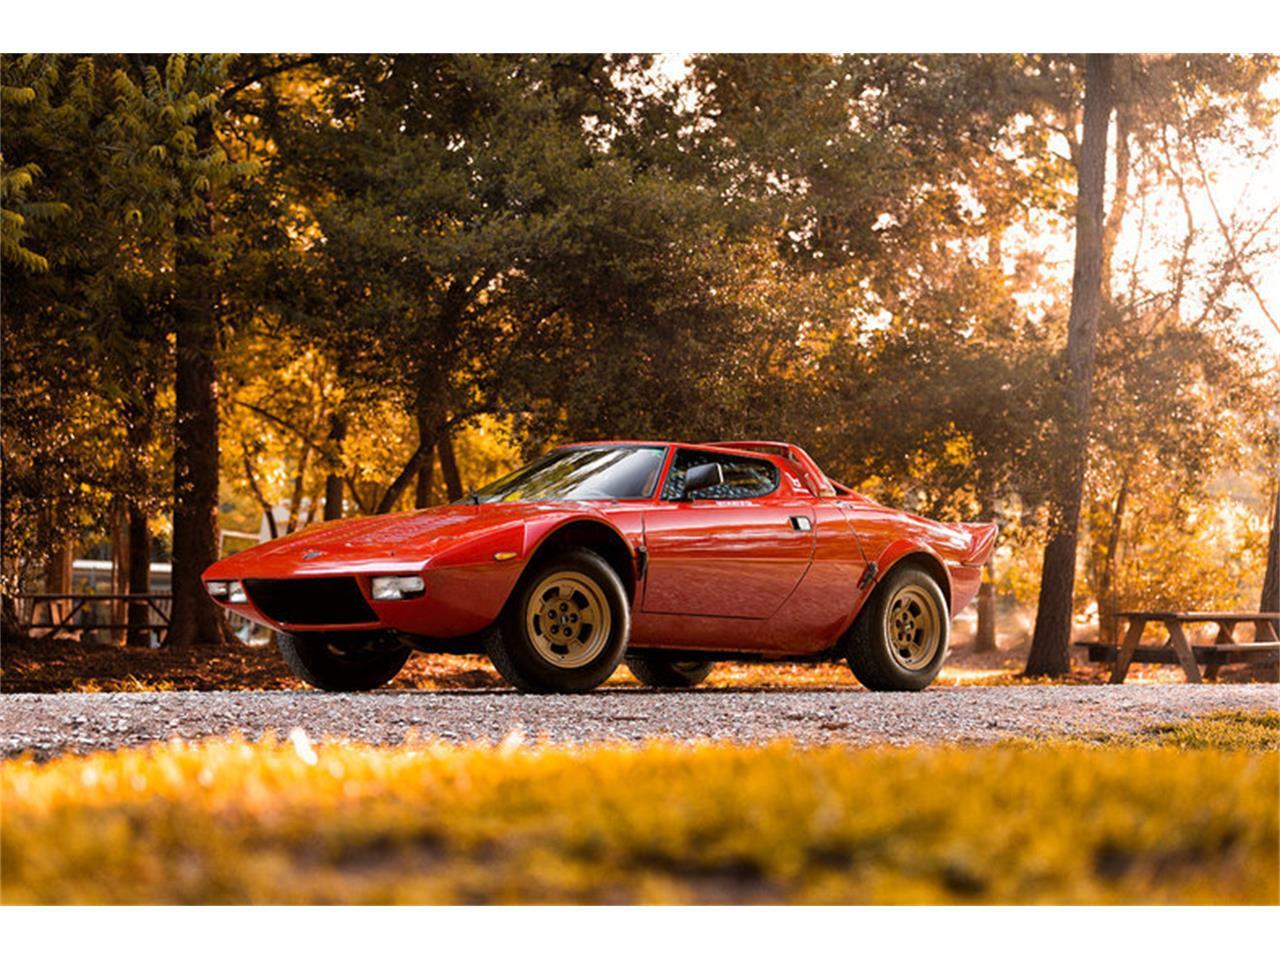 Lancia Stratos For Sale >> 1974 Lancia Stratos For Sale Classiccars Com Cc 993169